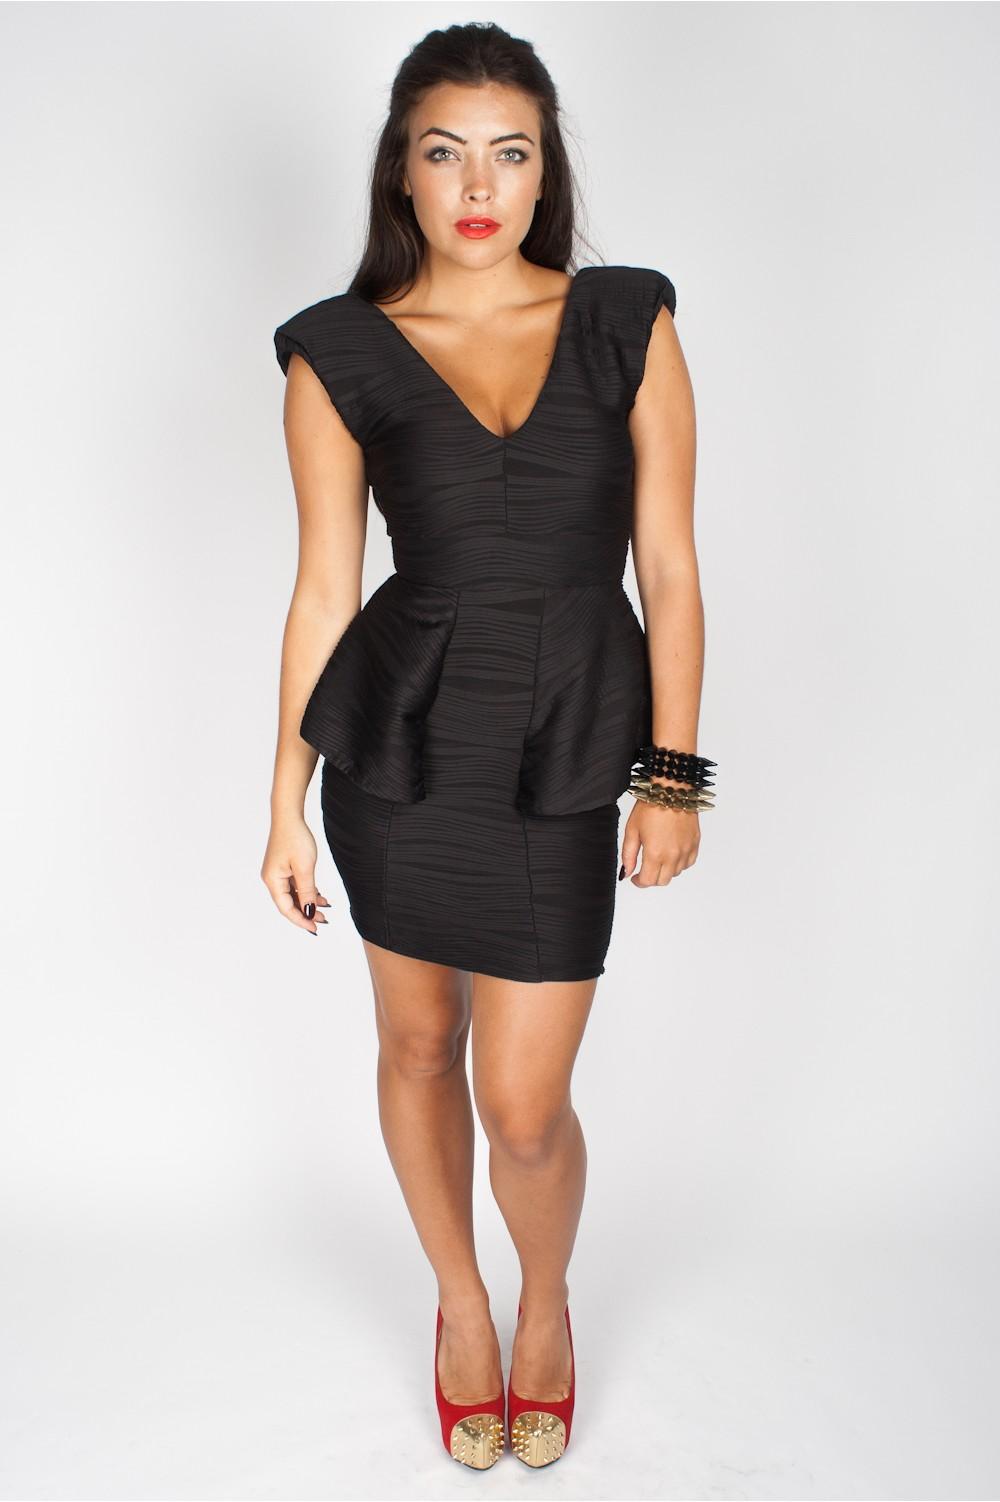 Black Peplum Dress Picture Collection Dressedupgirl Com